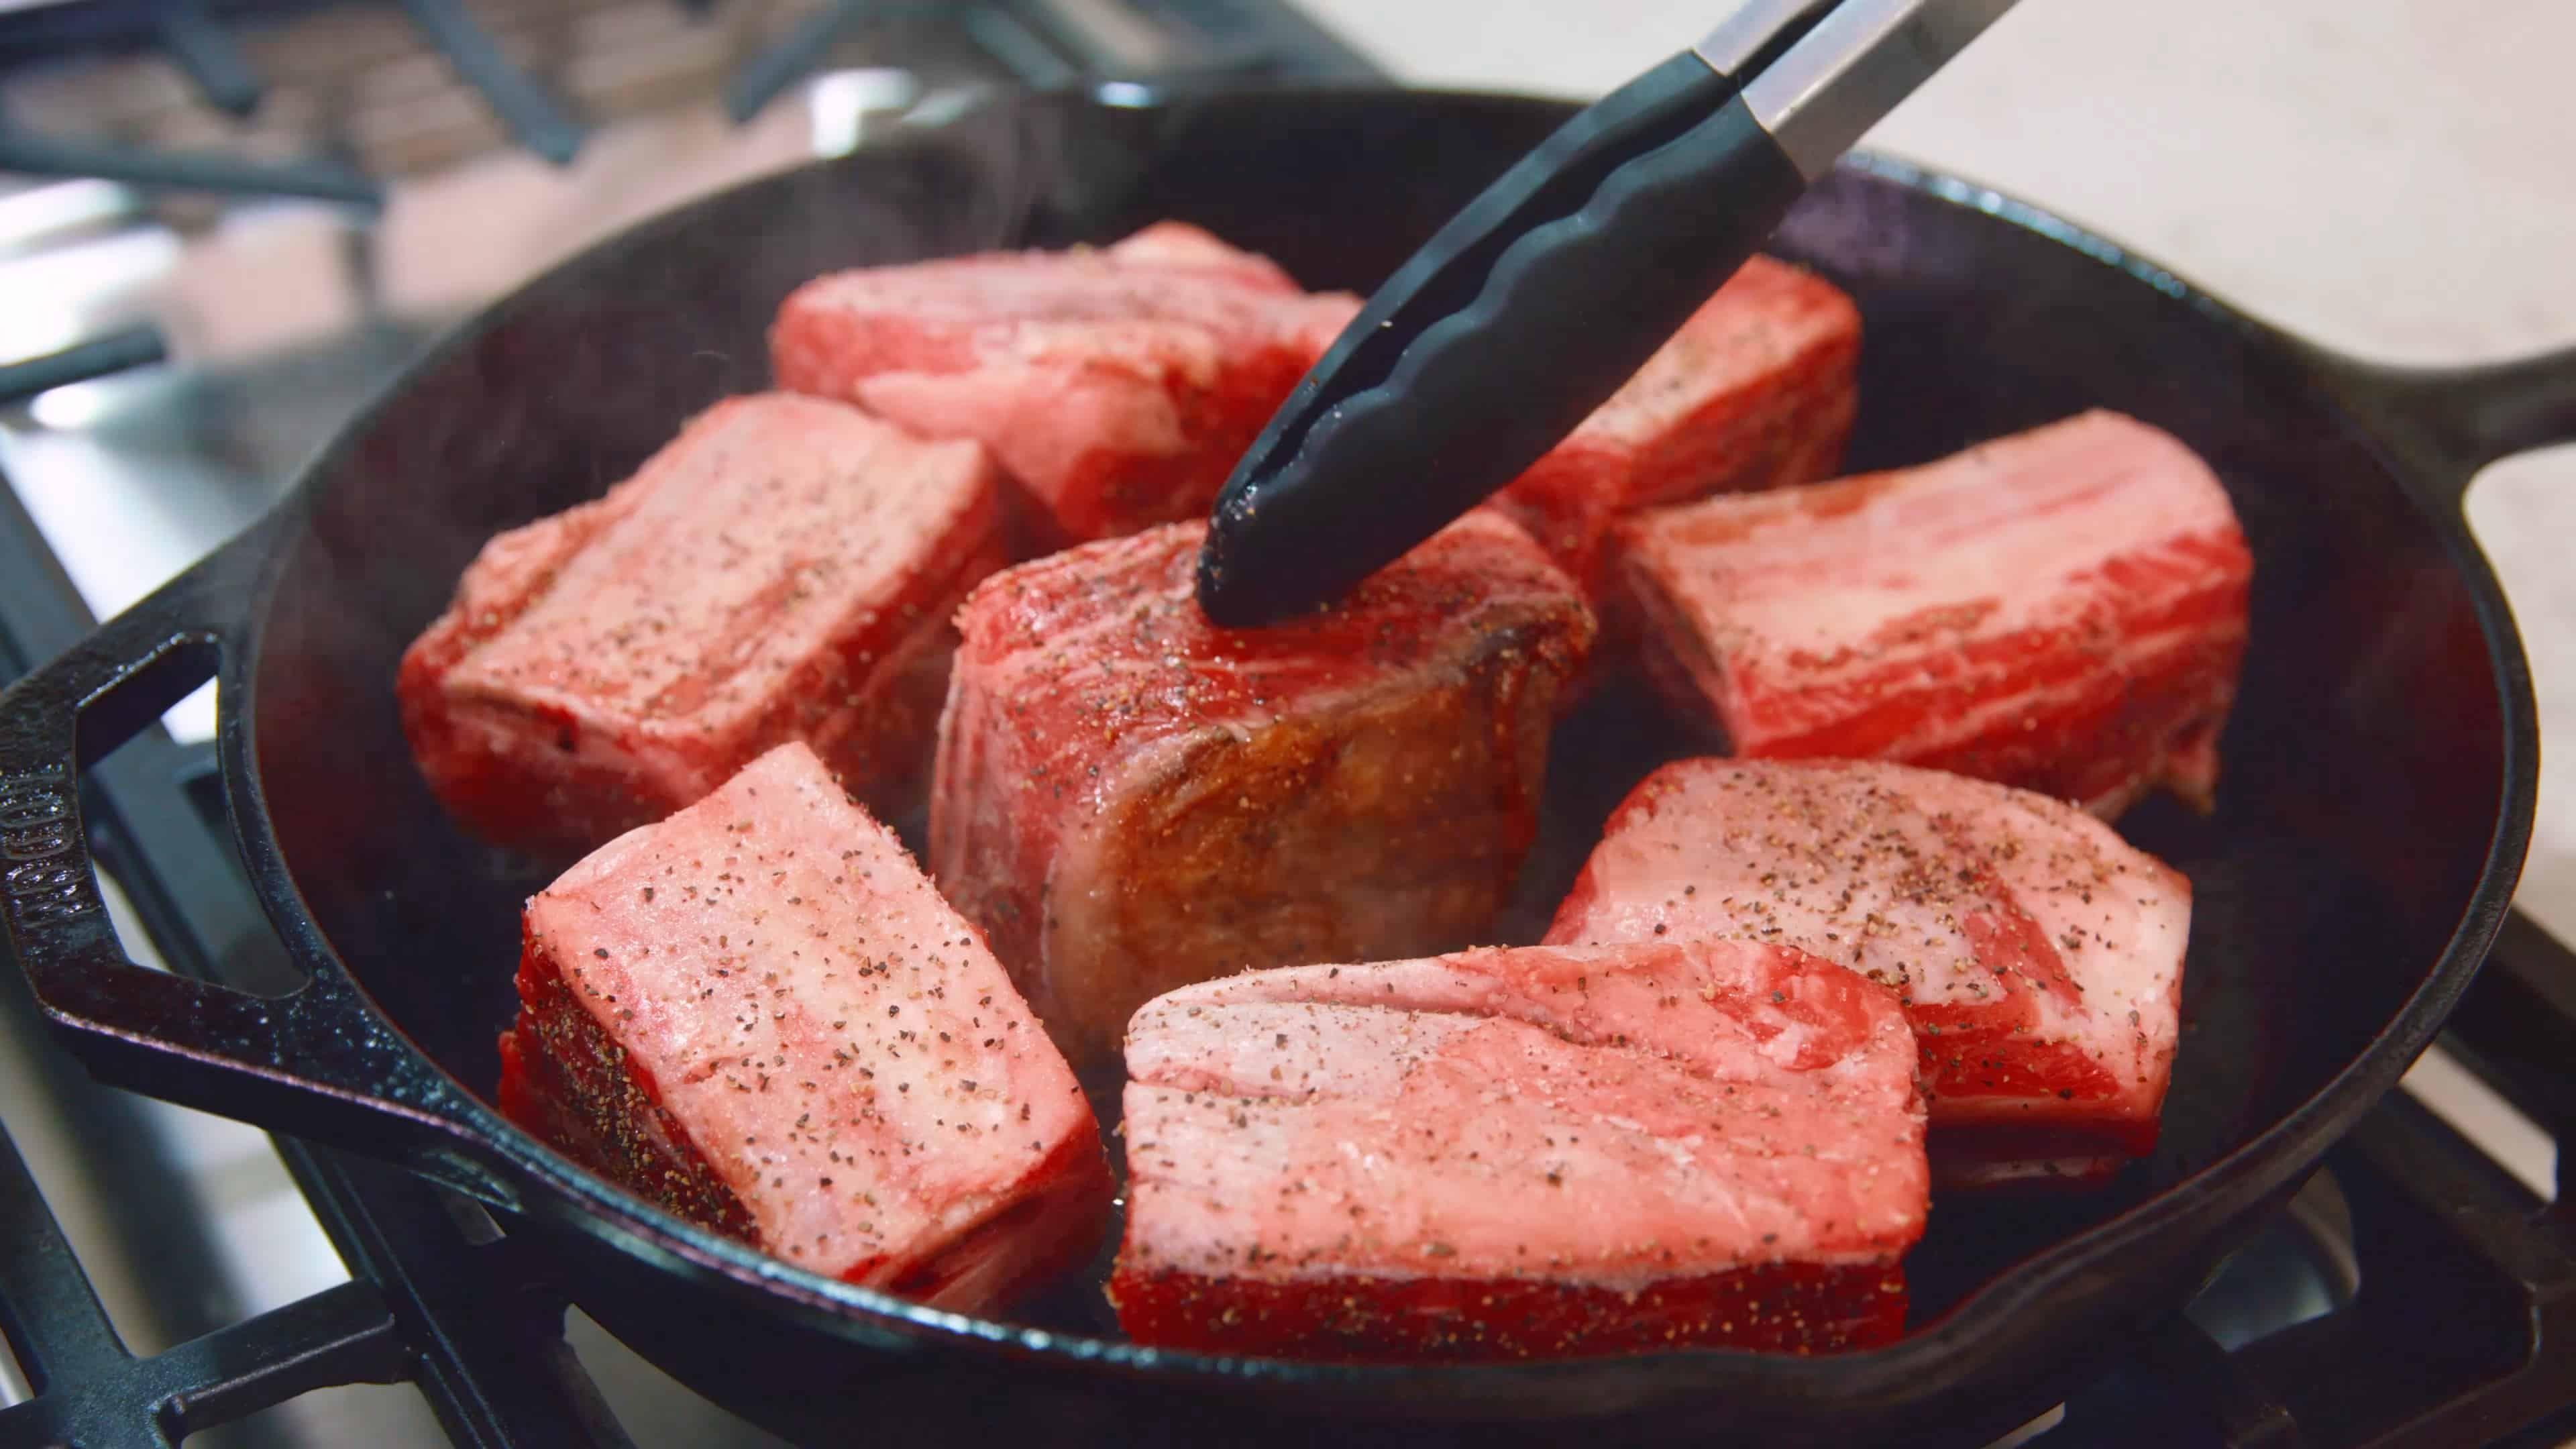 Slow Cooker Beef Short Ribs Recipe Slow Cooker Beef Beef Short Ribs Short Ribs